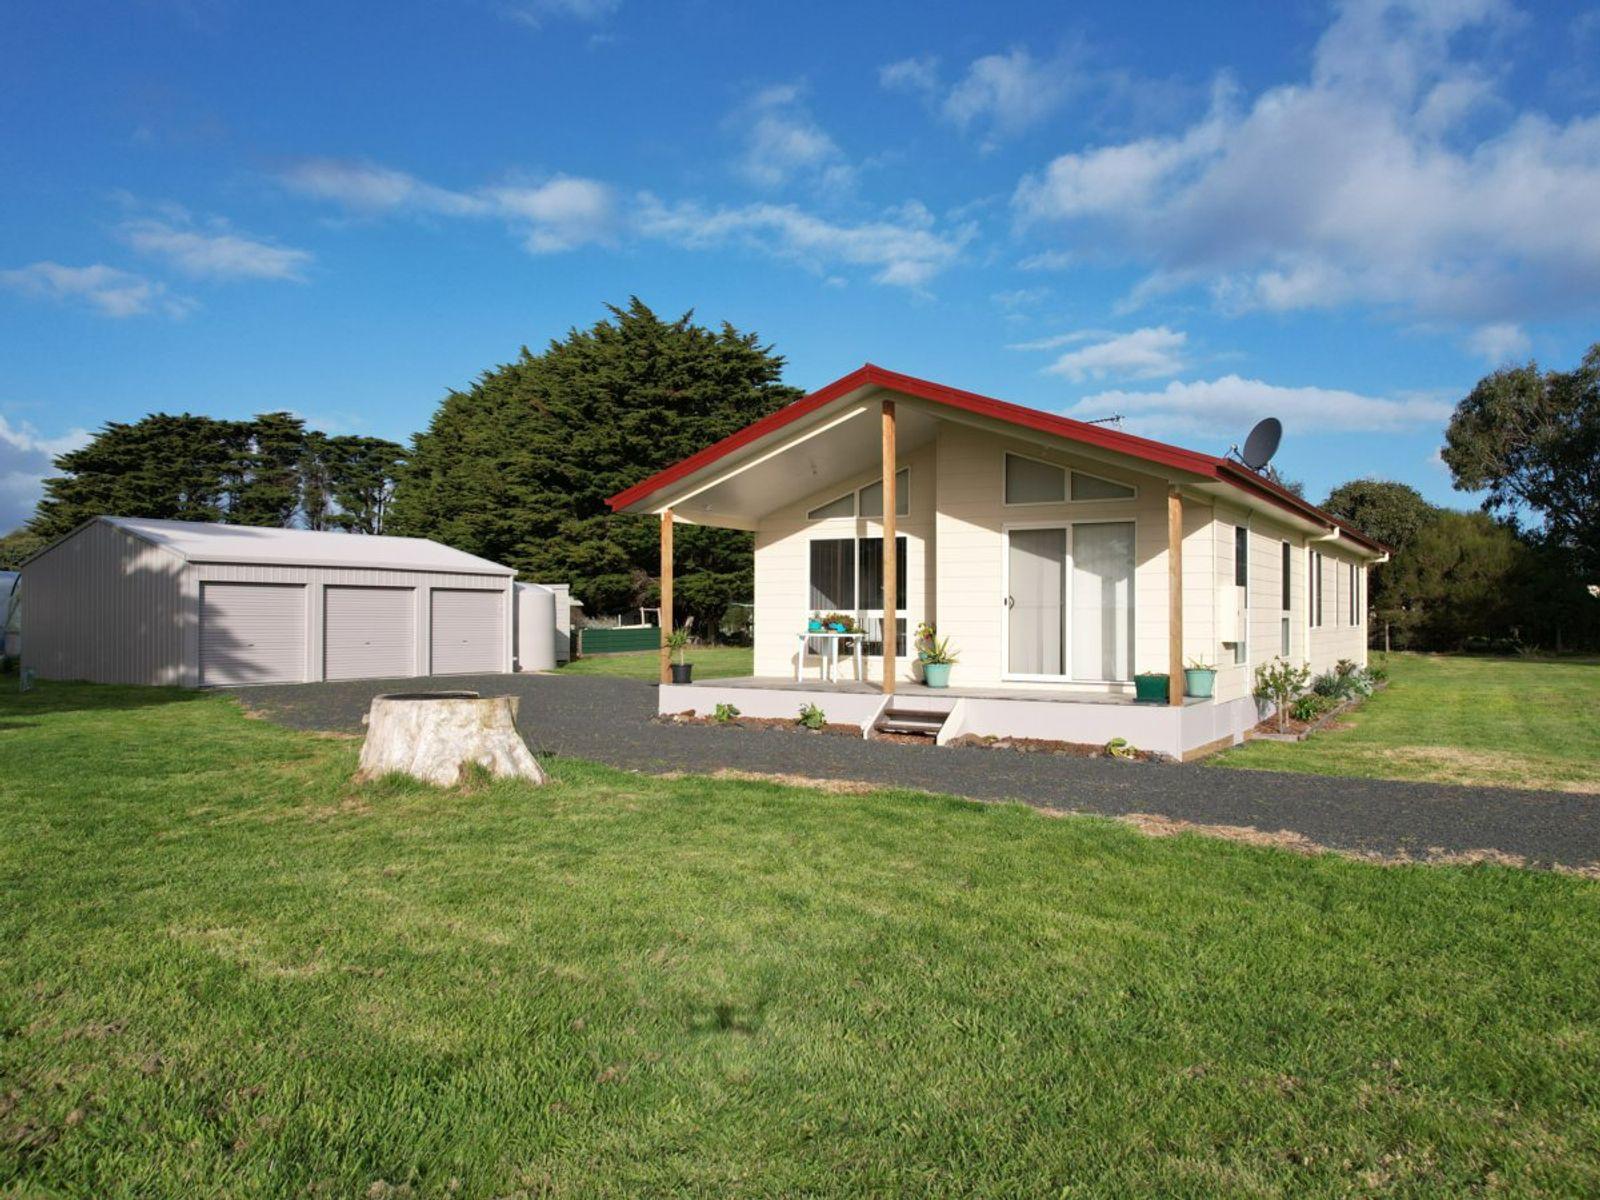 2067 Inverloch Venus Bay Road, Tarwin Lower, VIC 3956